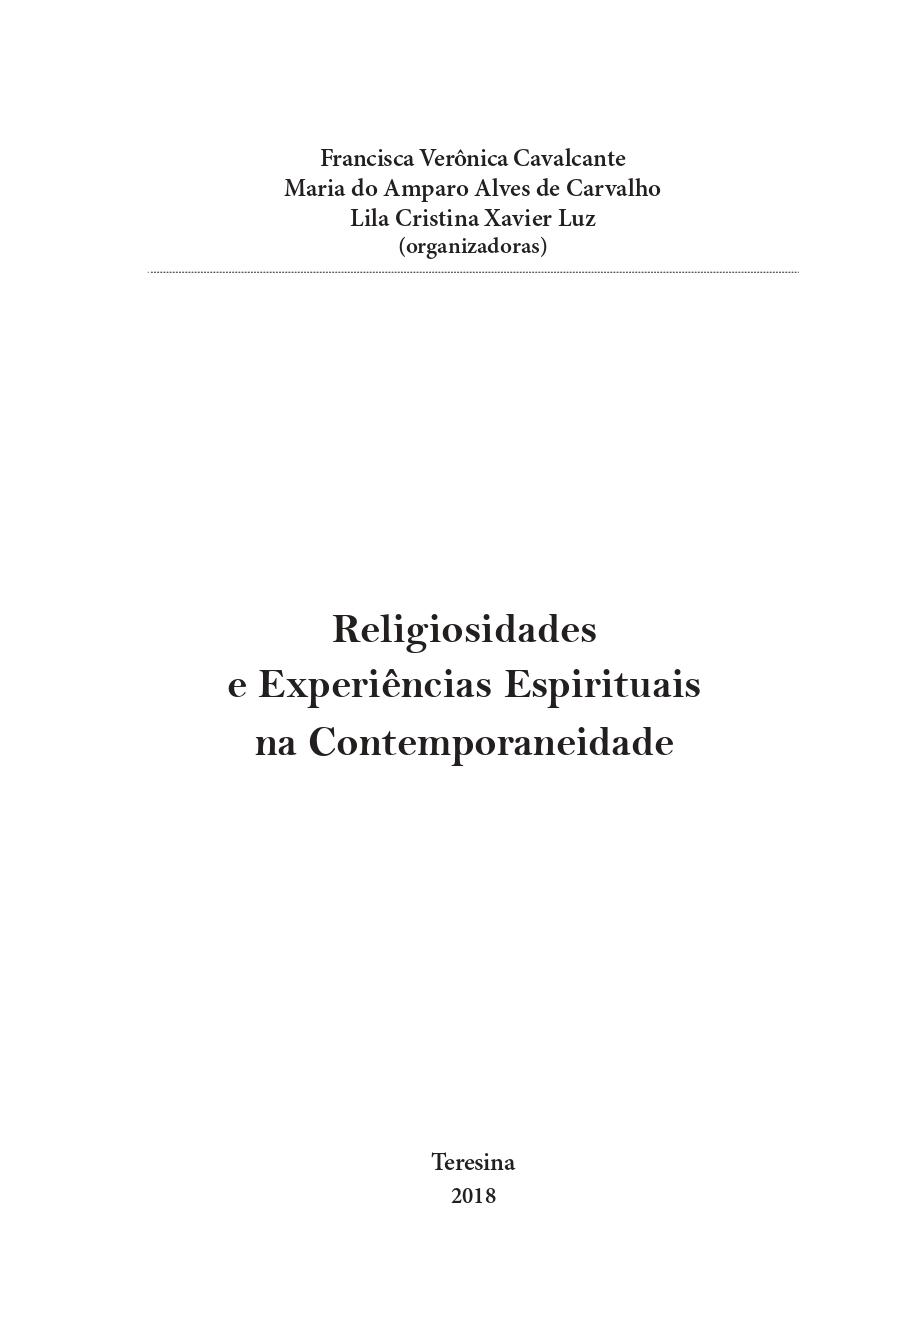 portada libro Religiosidades BRASIL 2018_page-0003.jpg